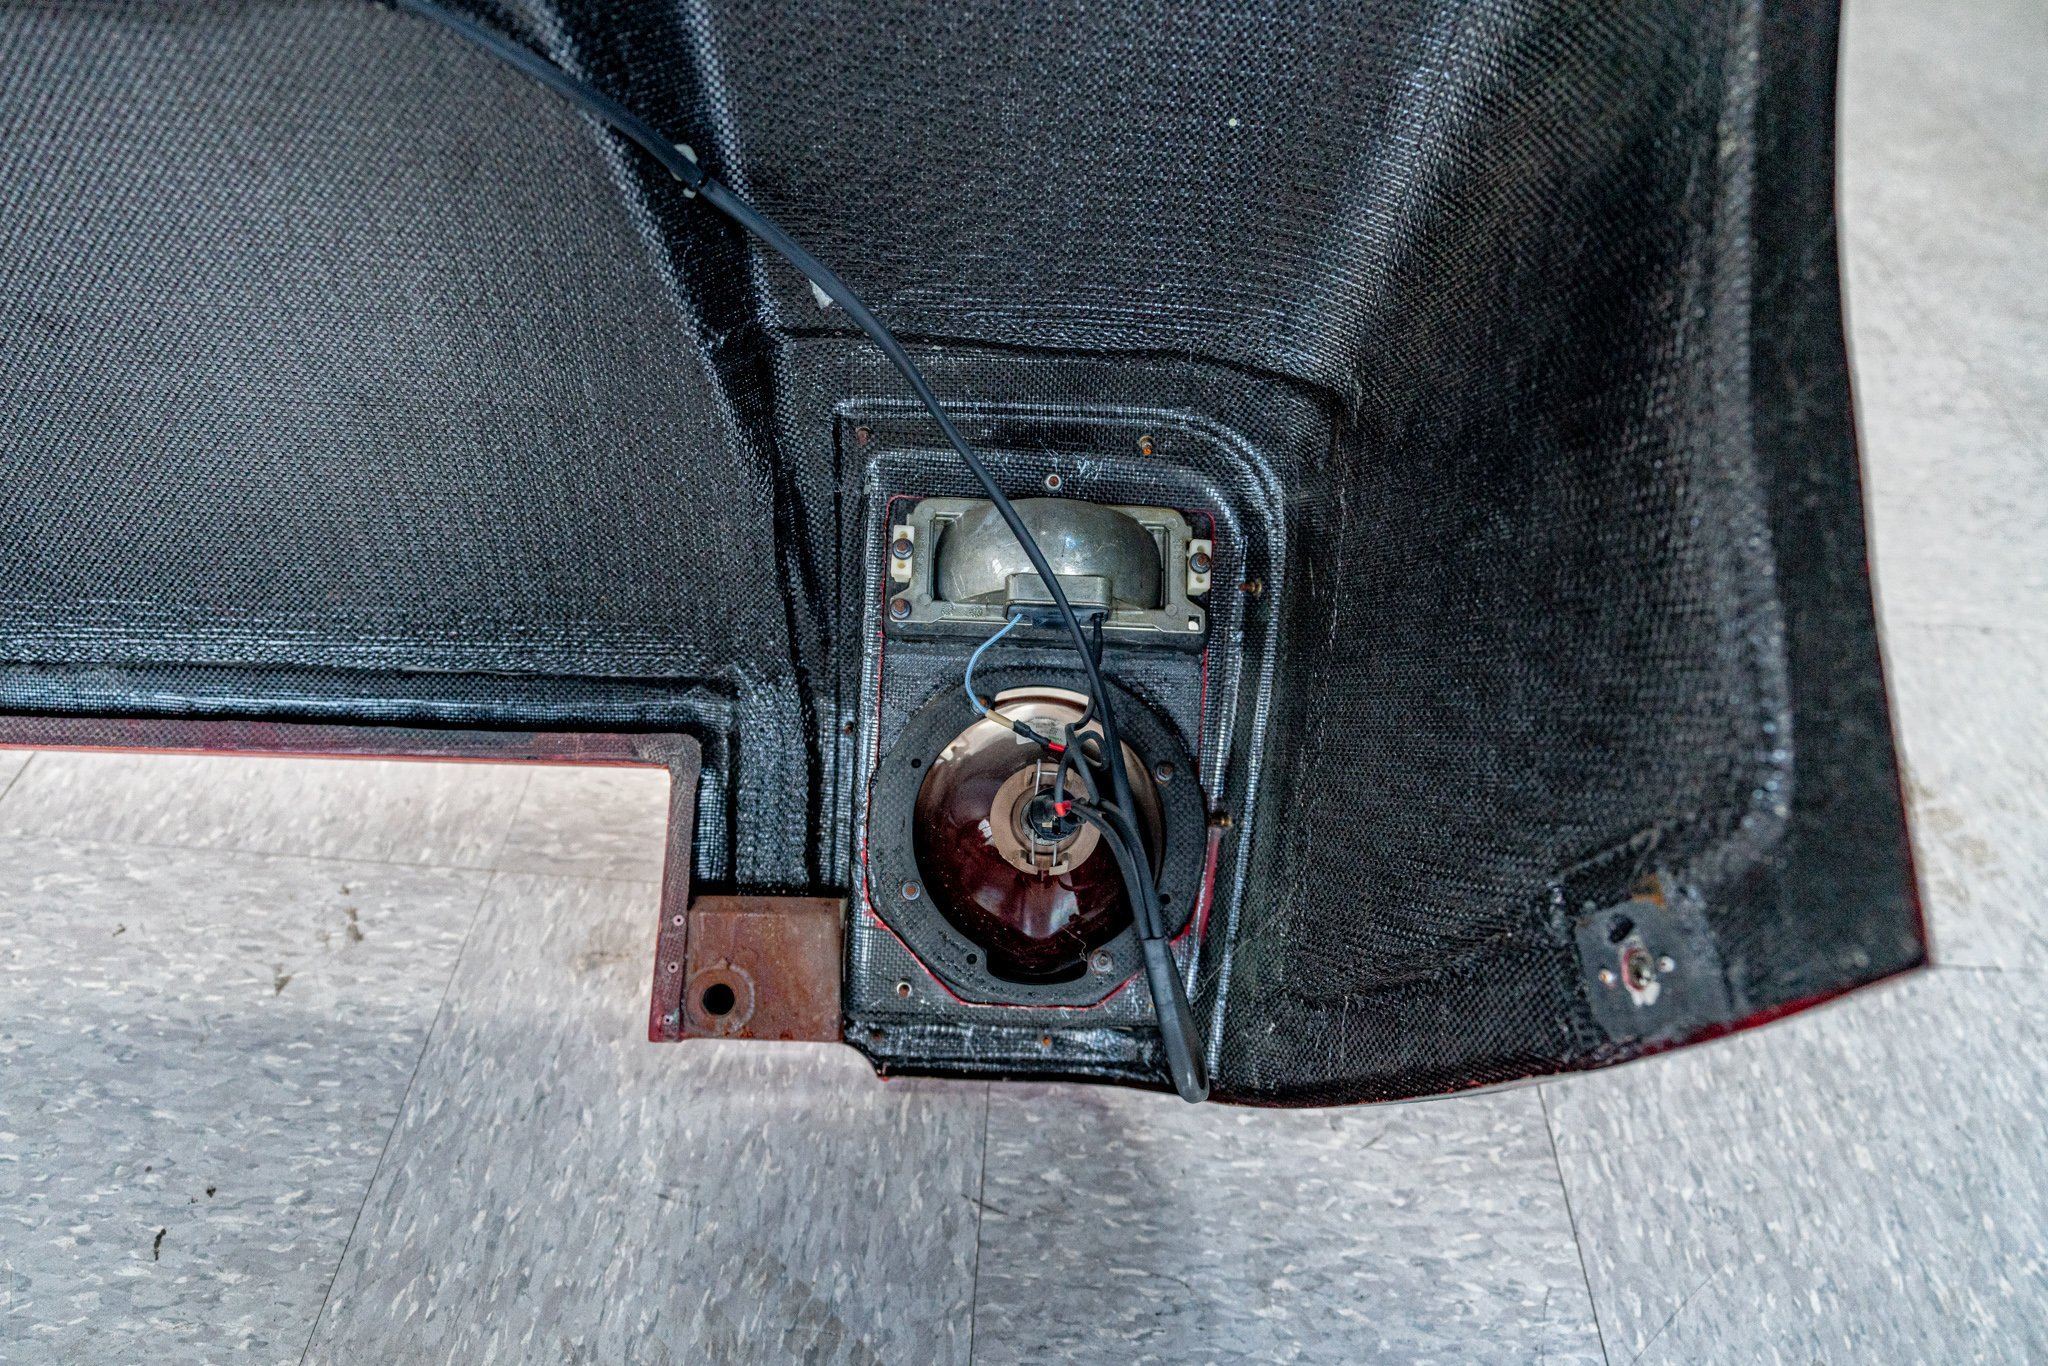 original spare nose from ferrari 333 SP #06